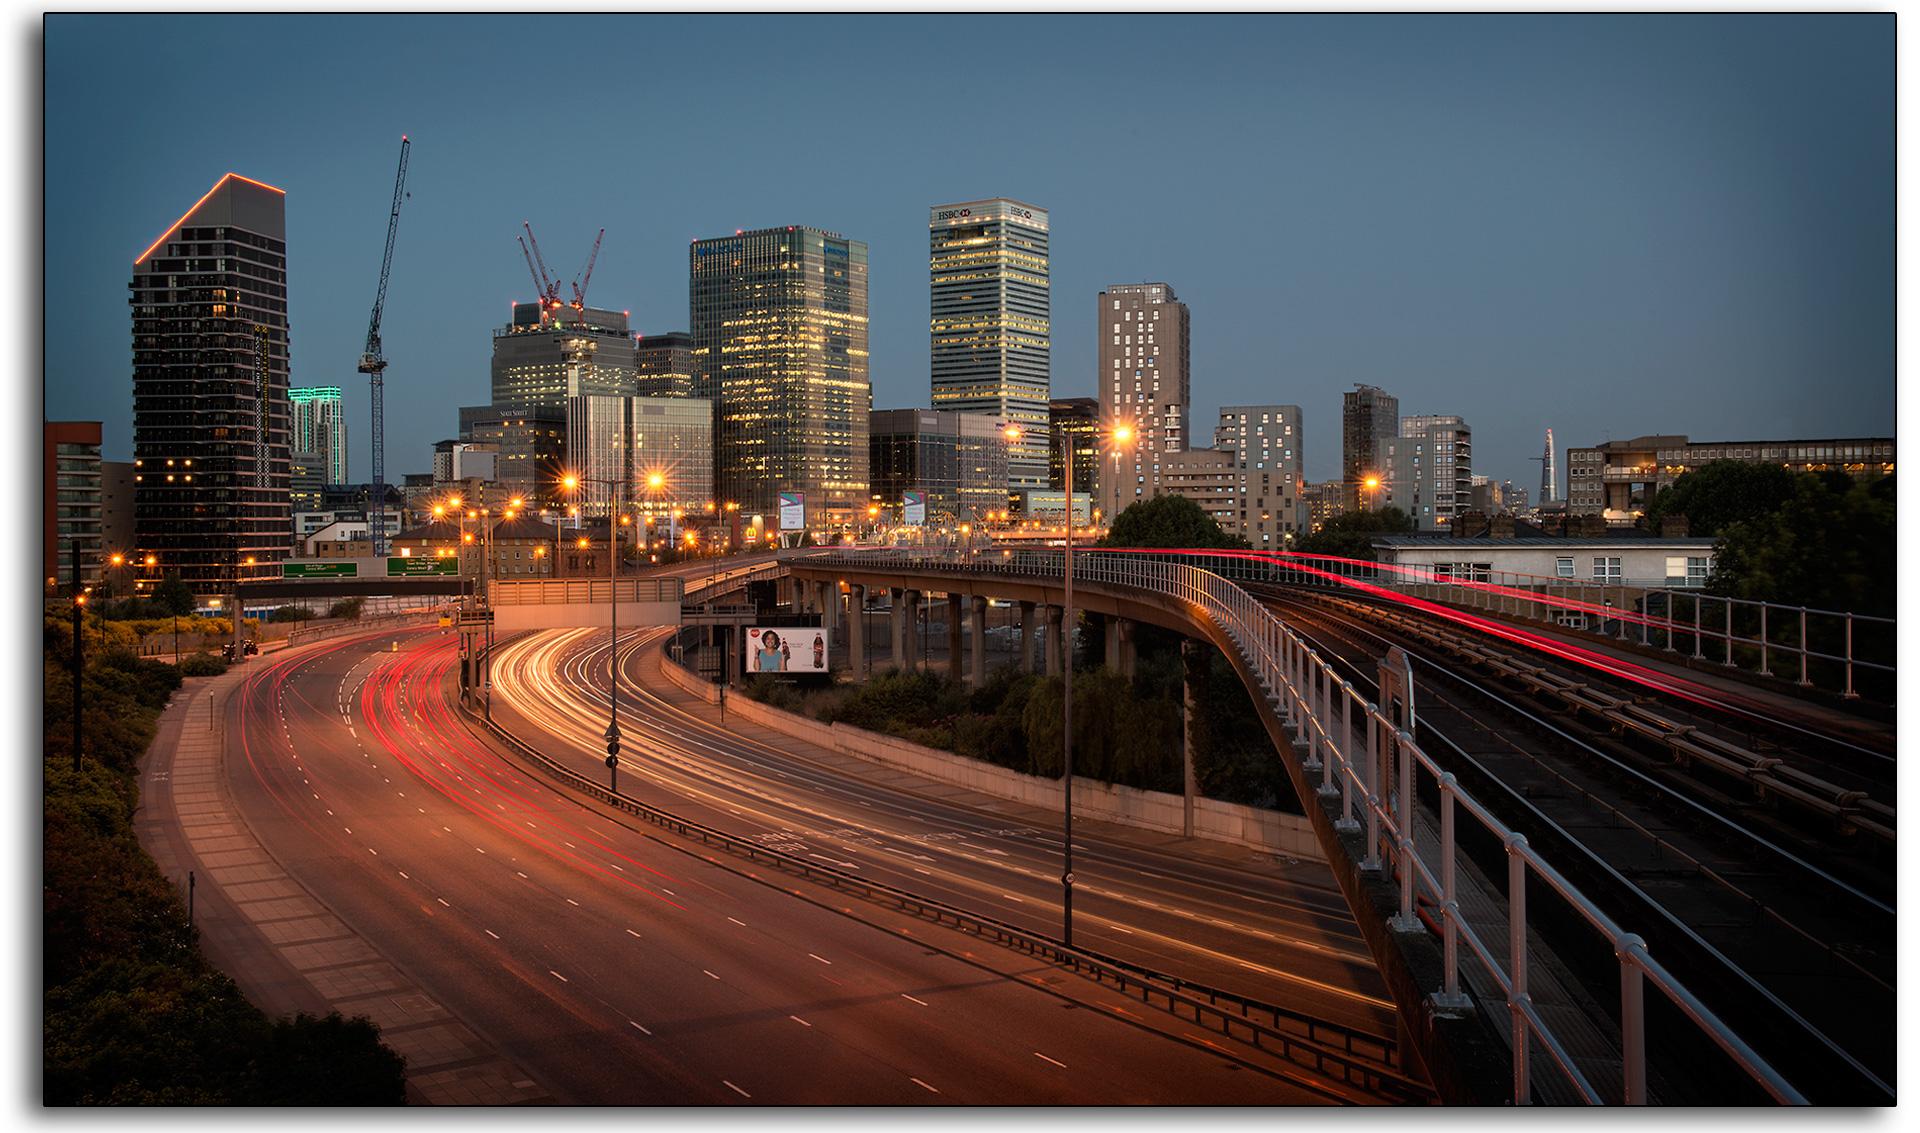 boarder 02 light trails Canary Wharf tram train cars dusk dawn cranes long exposure london landscape lee ramsden art professional photographer www.leeramsden.com.jpg